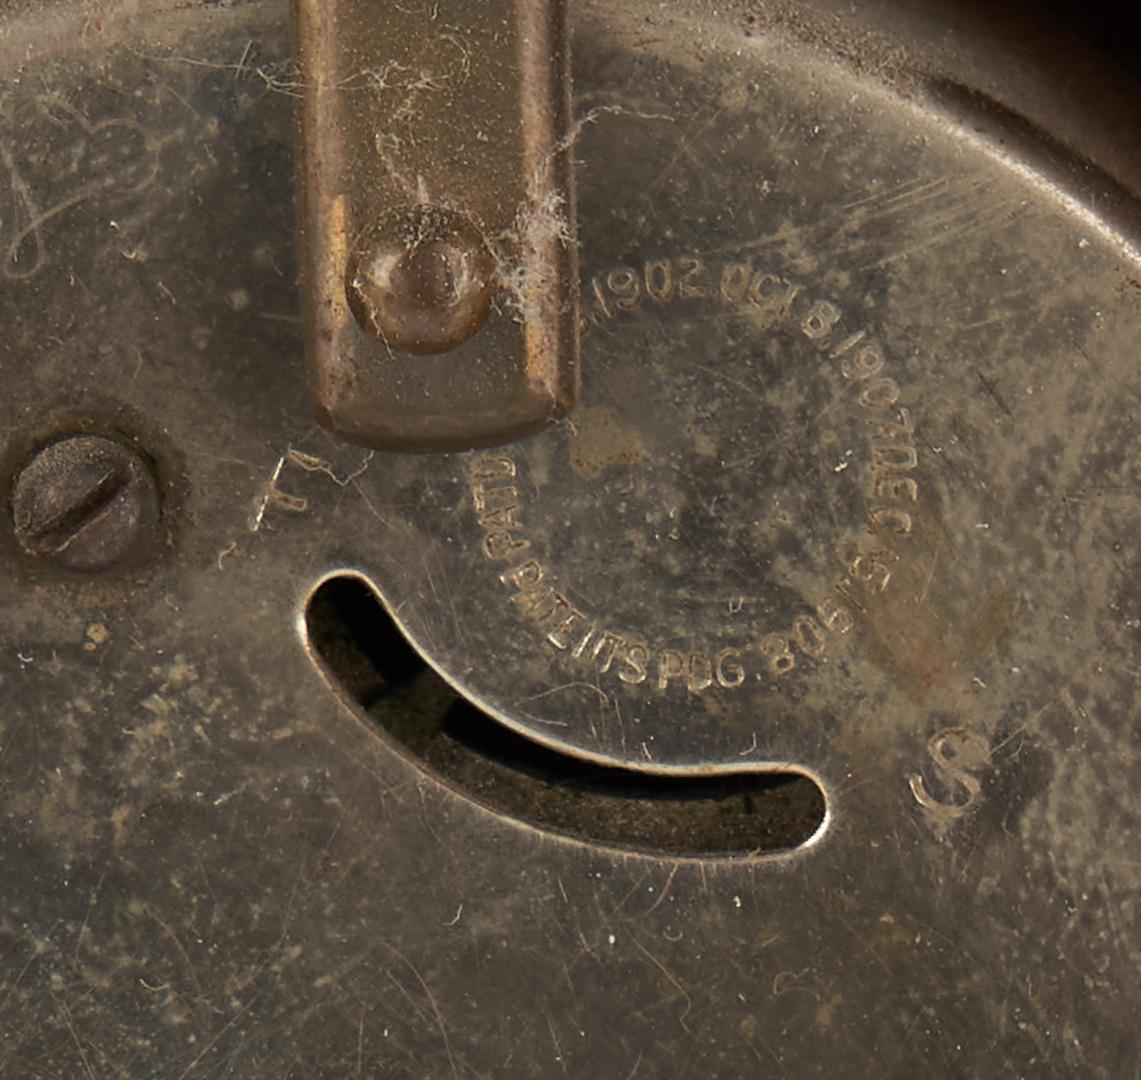 Lot 438: English Miniature Chest, Chinoiserie Pocket Watch Holder, & Santos Figure, 3 items